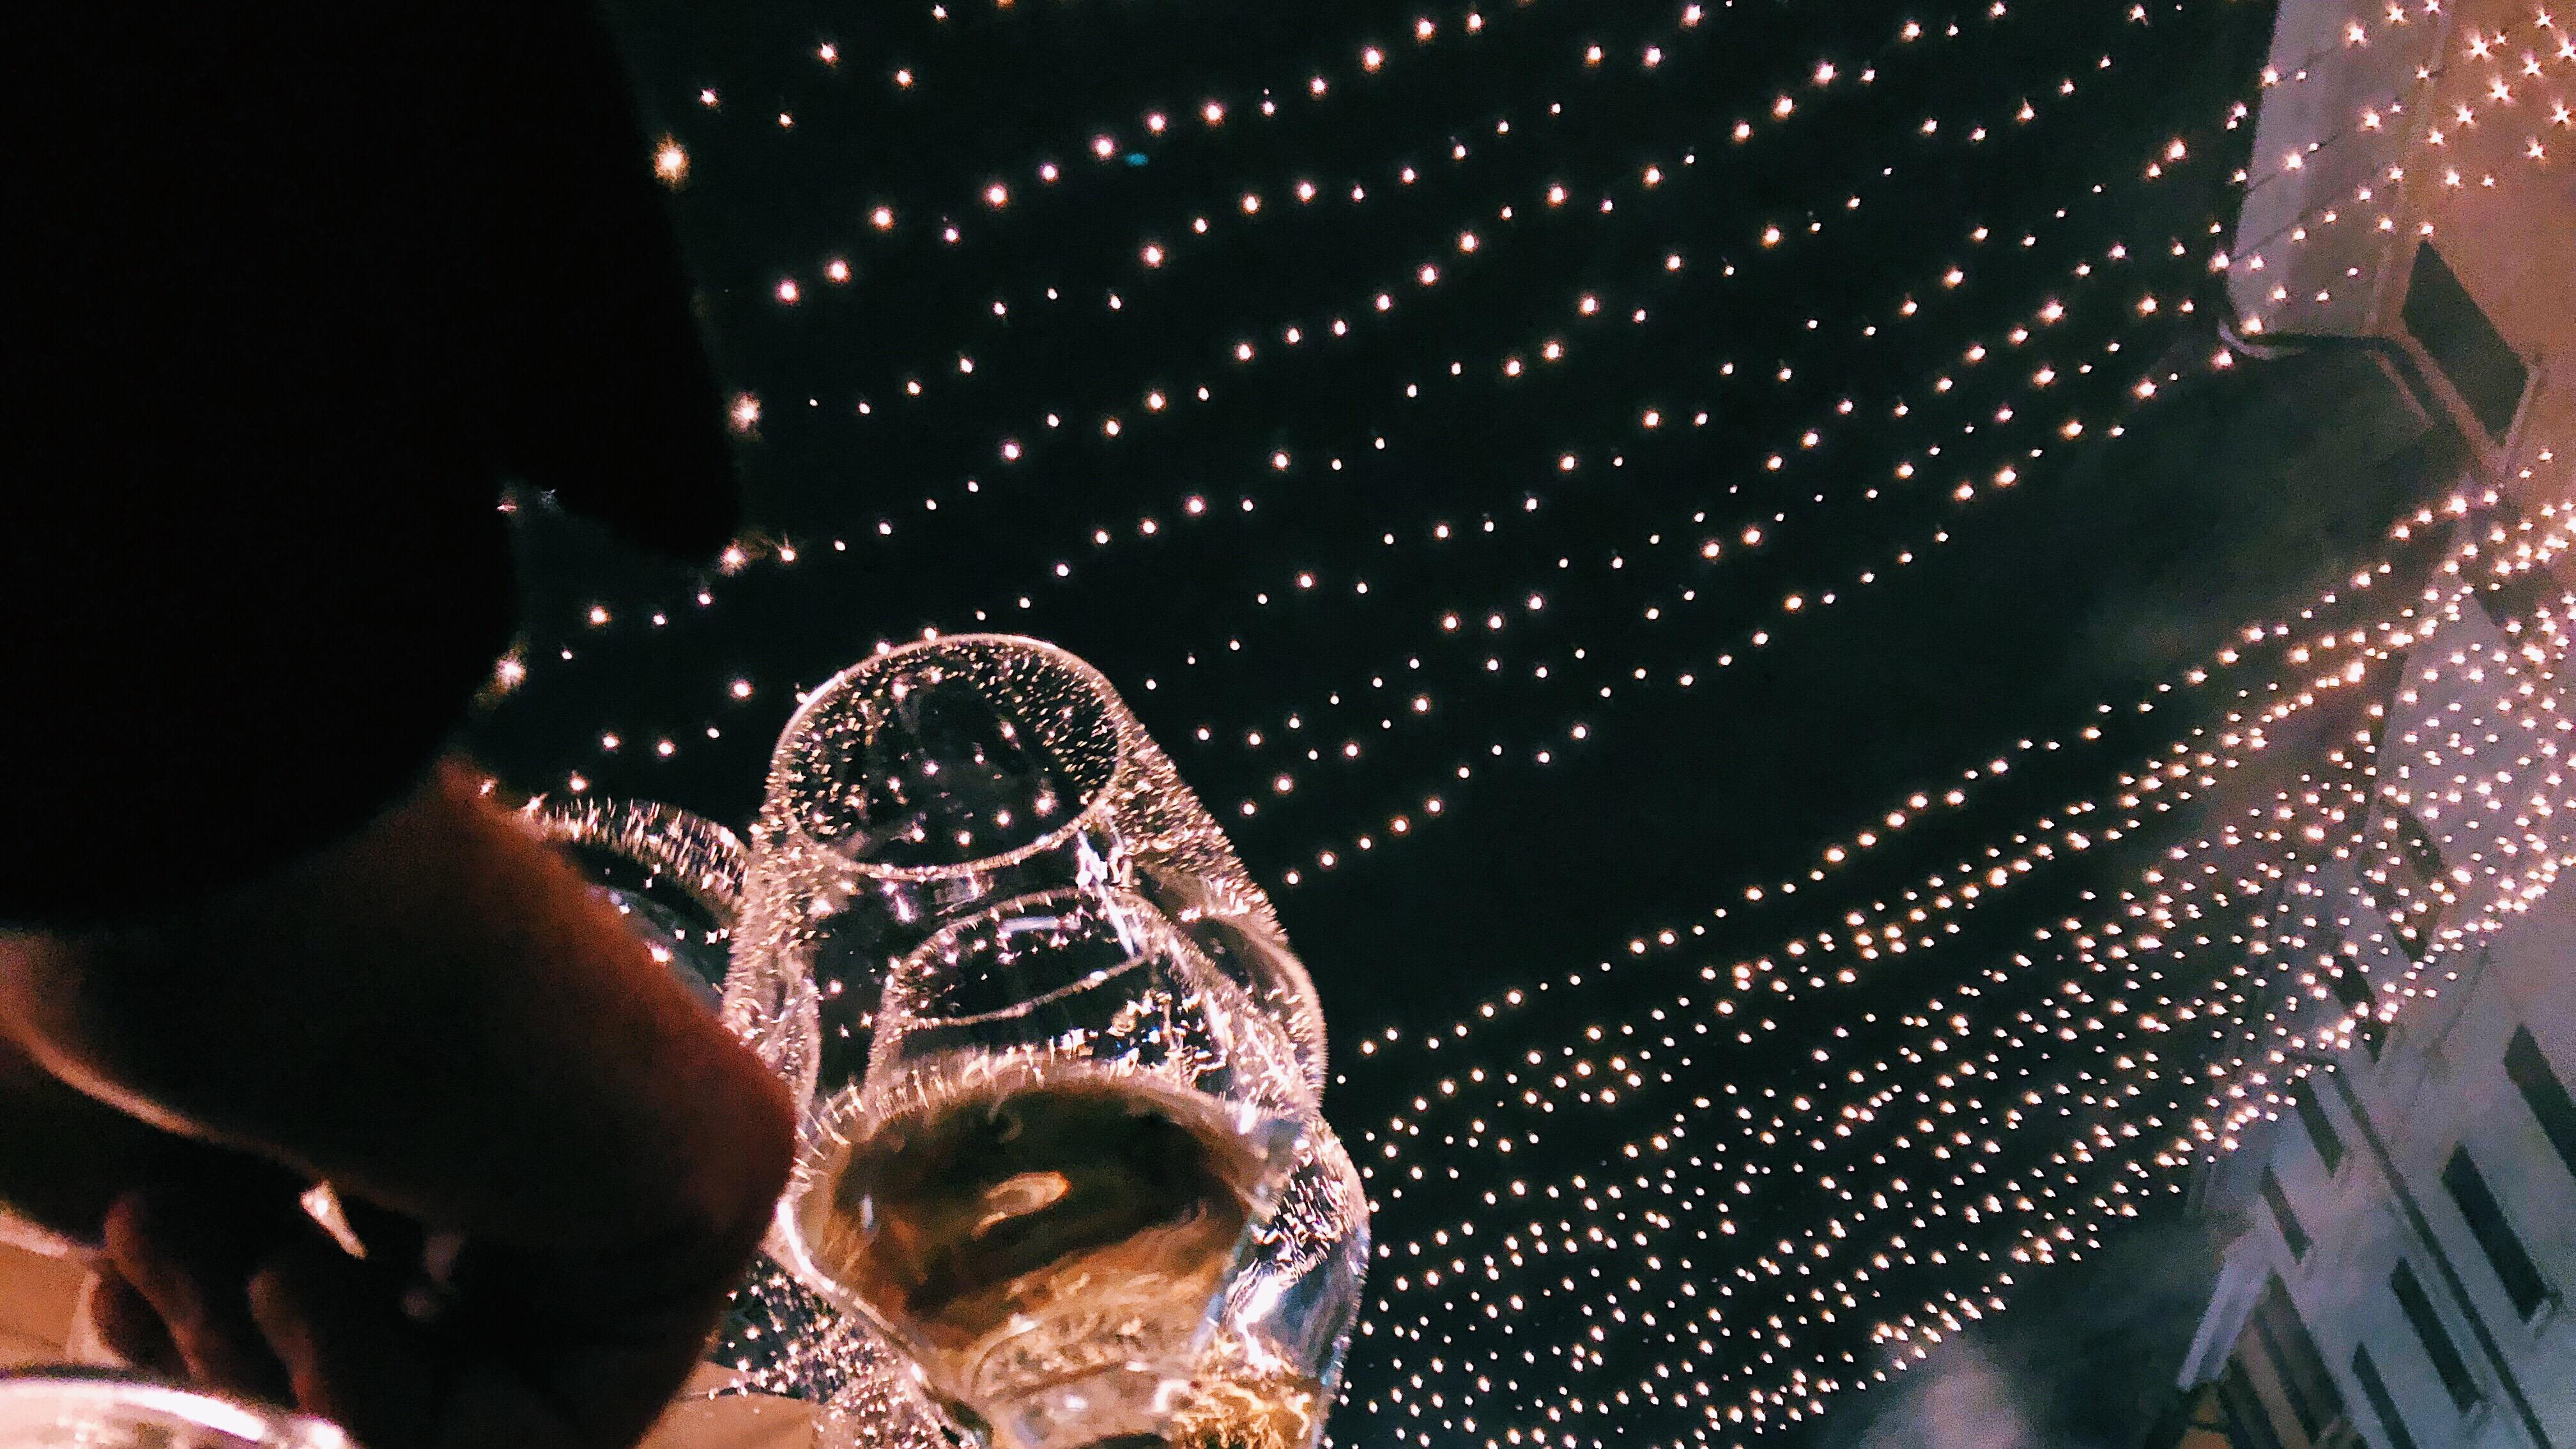 New Year's Eve 2020: 8th Annual Resolution Gala at Aon Grand Ballroom